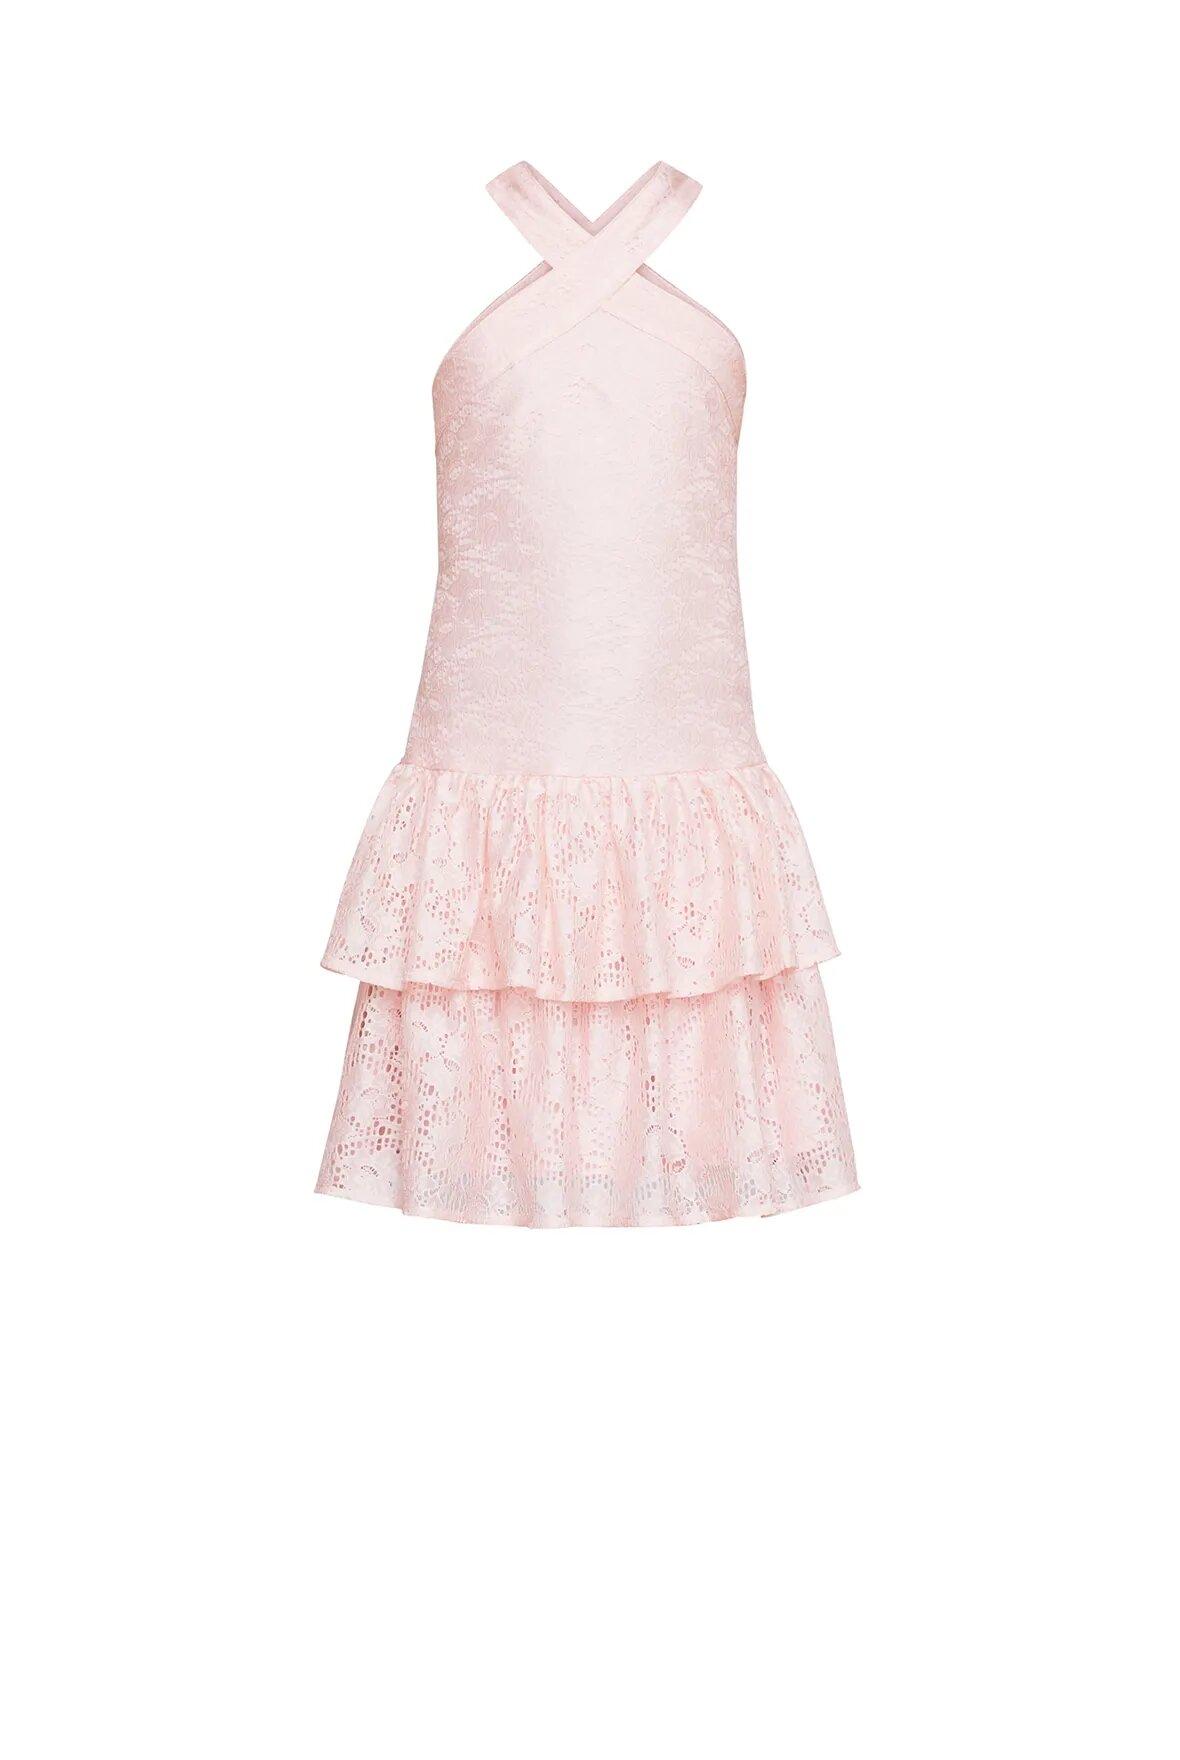 Vestido-halter-BCBGirls-rosa-claro-con-encaje-B838DR205_RPL_e